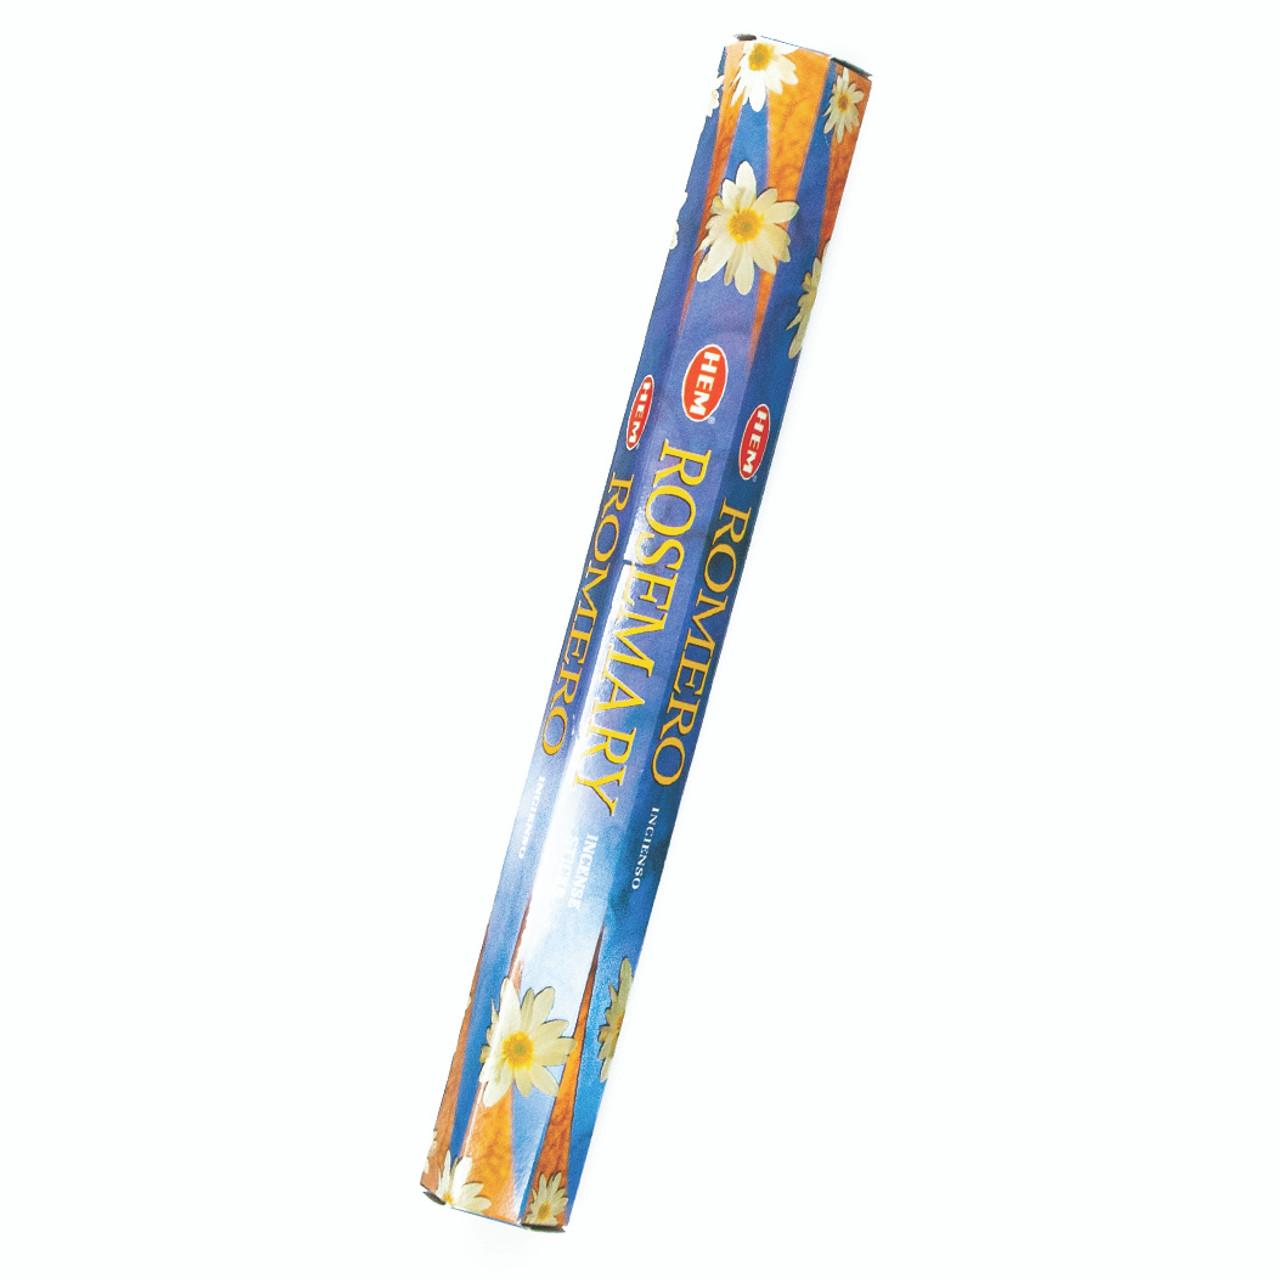 Incienso Exagonal Romero (Rosemary Incense Sticks)